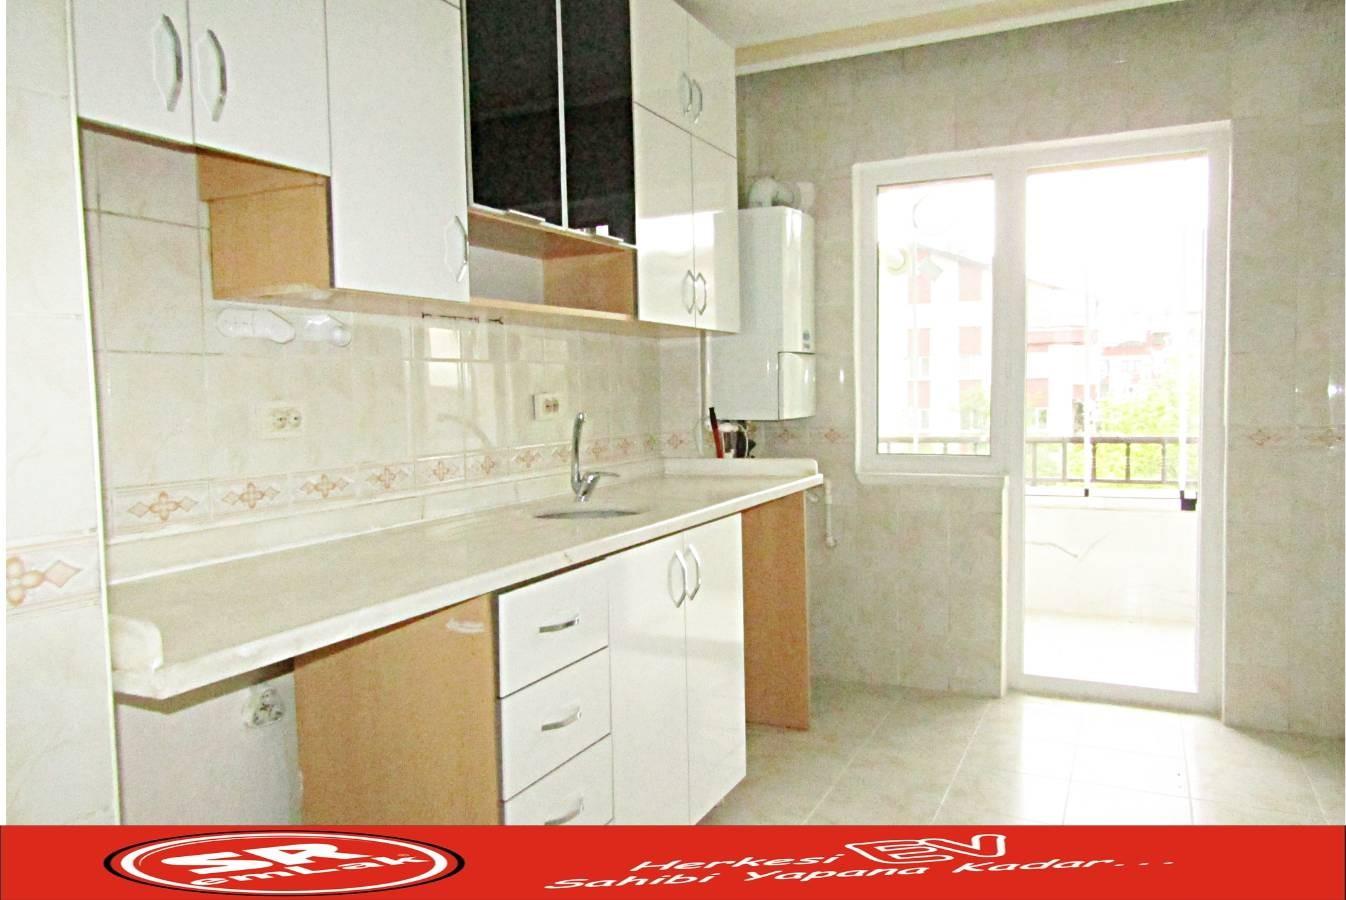 SR EMLAK'TAN SÜVARİ MAH'DE 3+1 115 m²  KATTA  YAPILI  TRENE YAKIN DAİRE